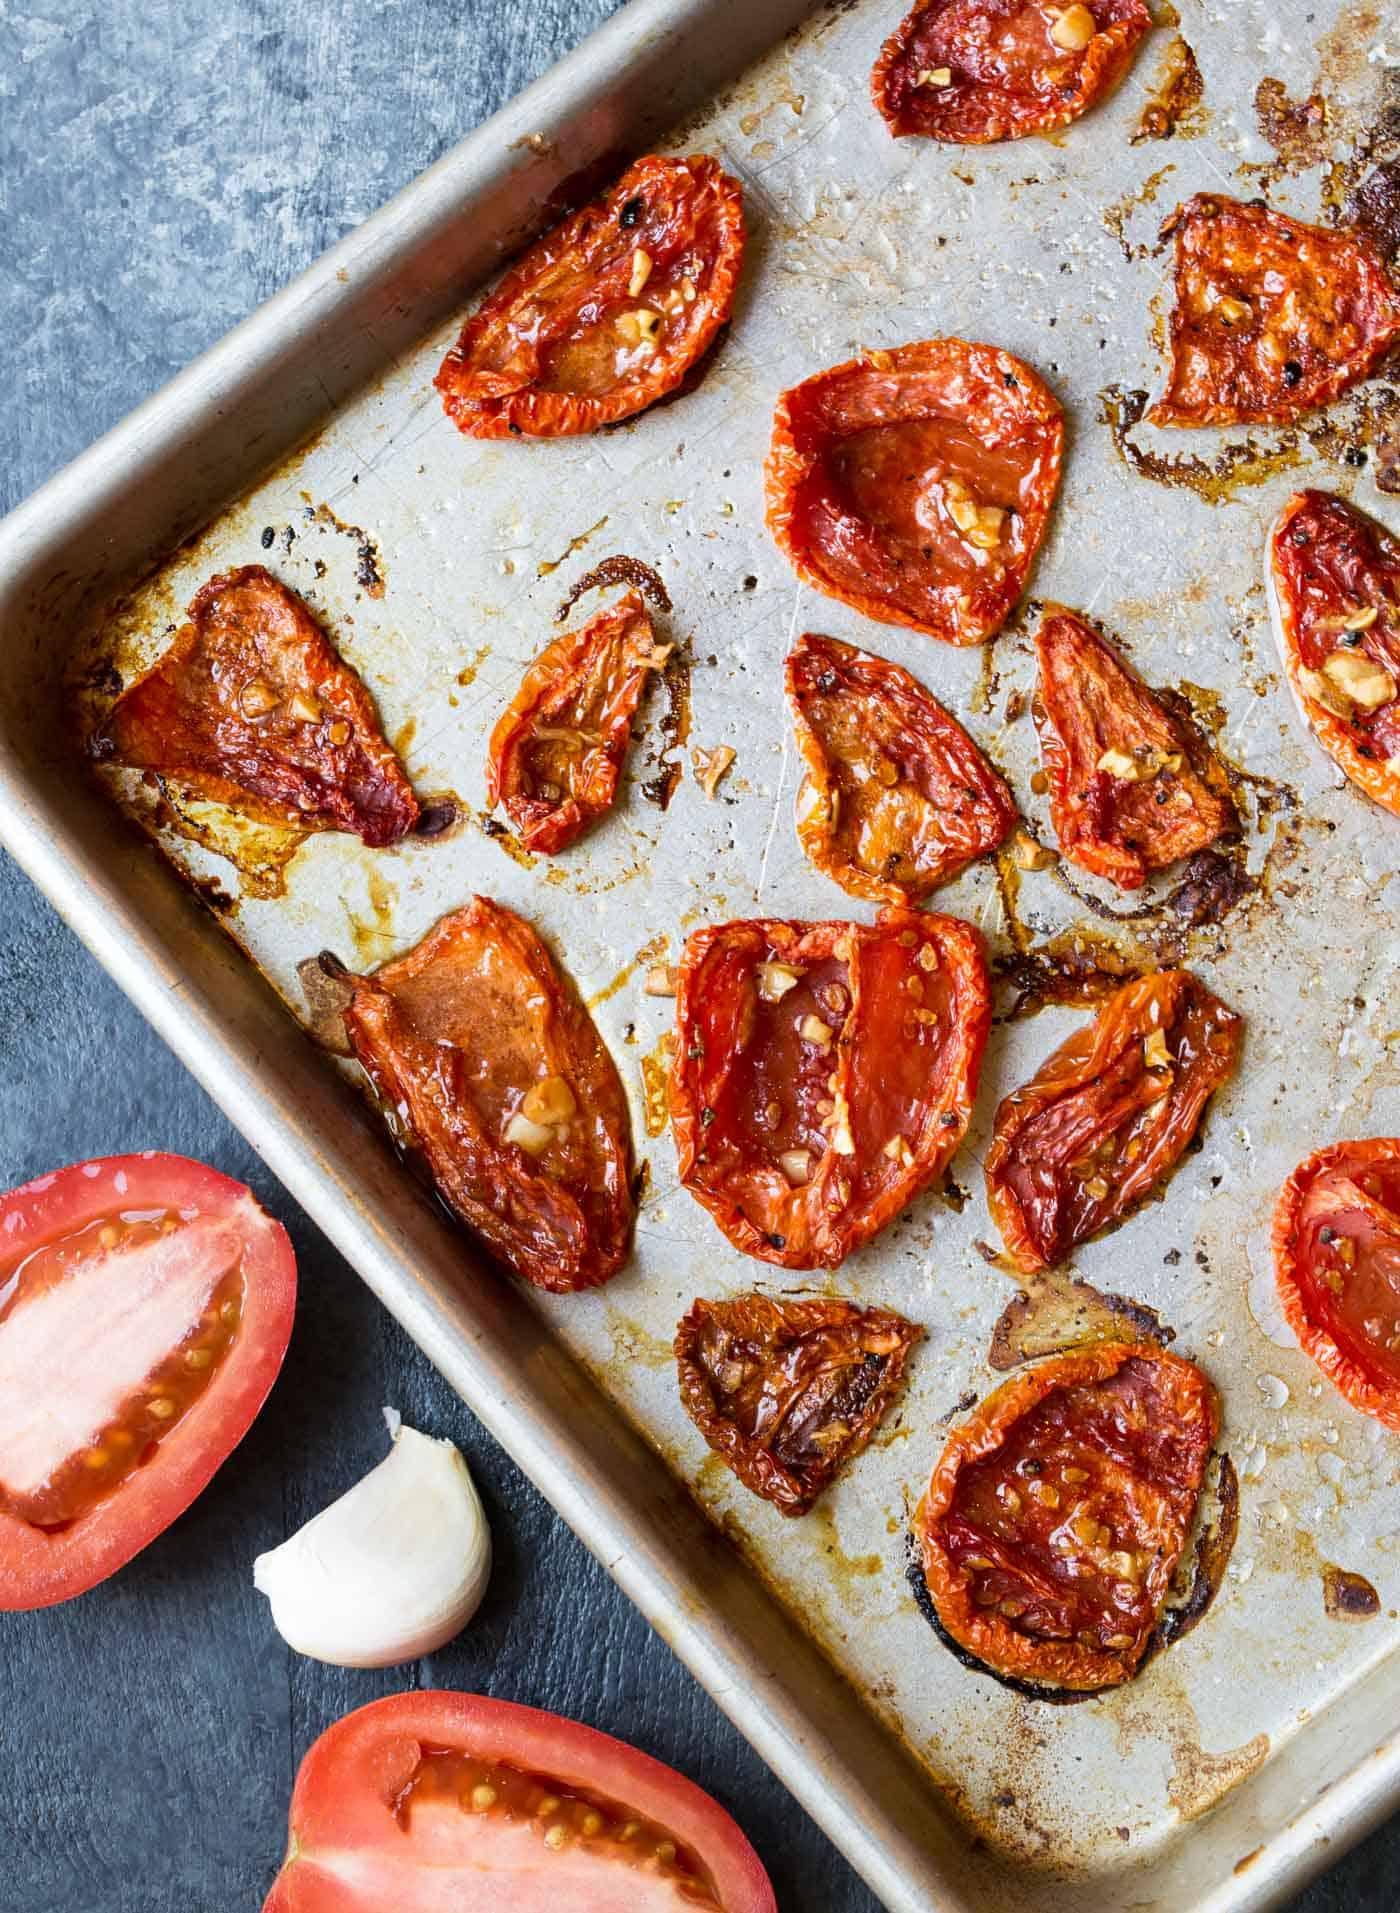 Roasted tomatoes on sheet pan.